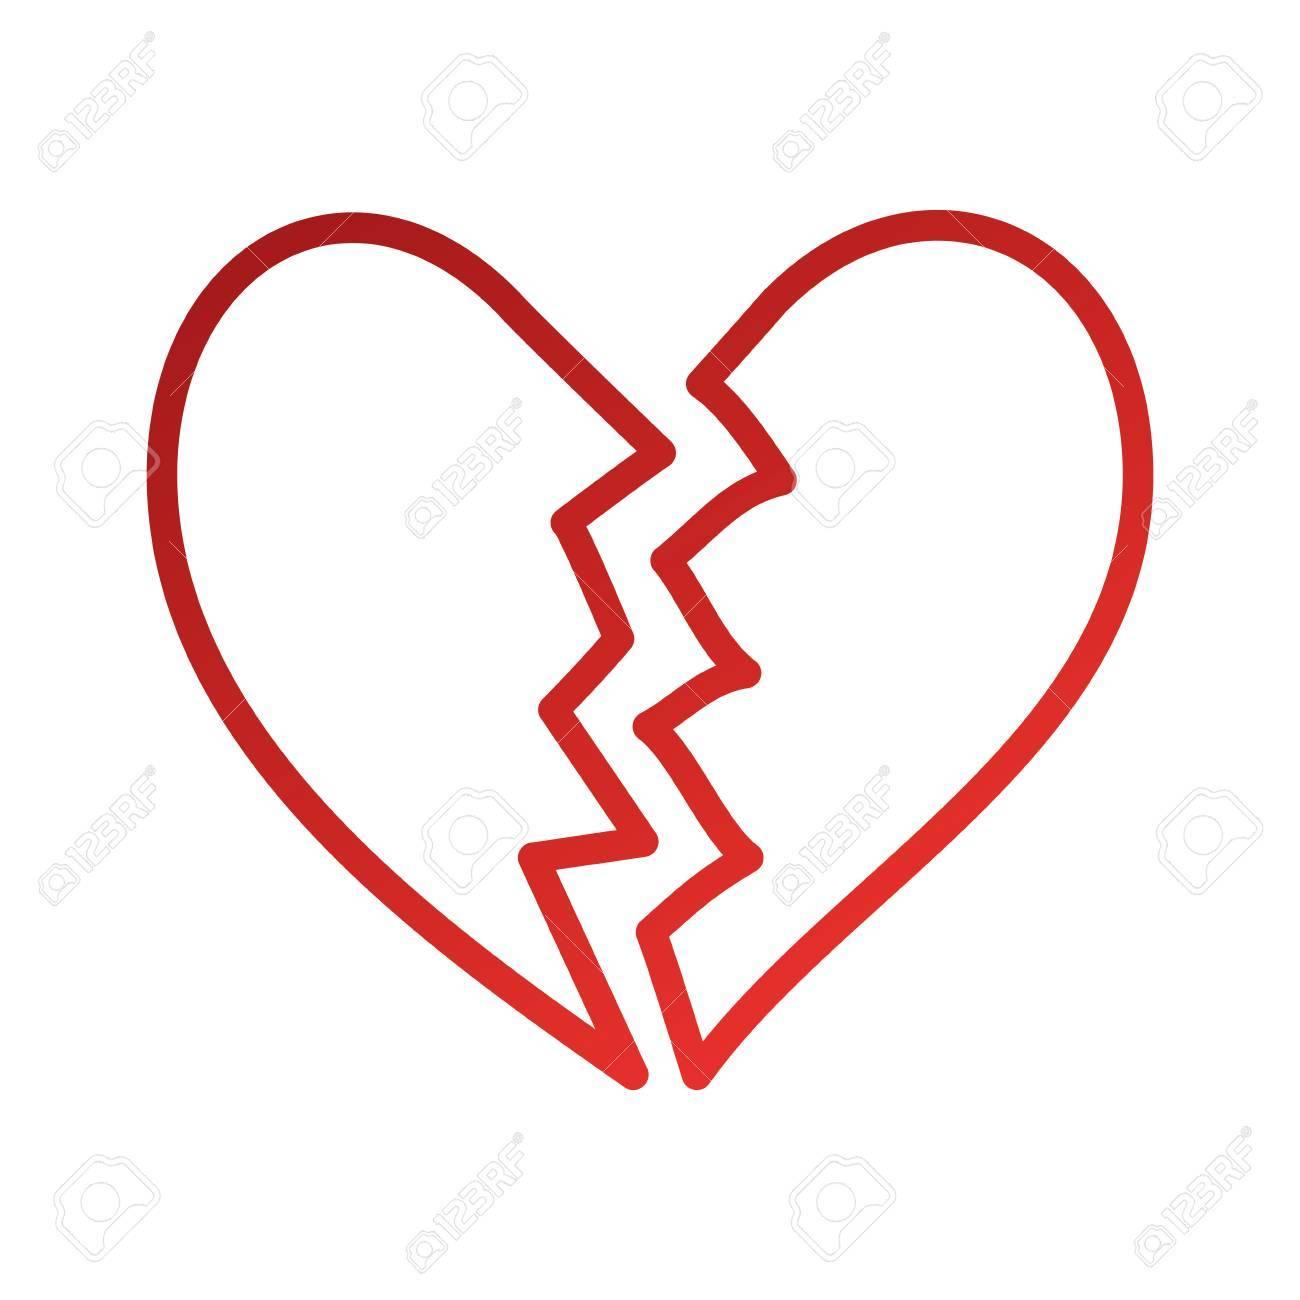 broken heart icon divorce end of love symbol vector illustration - 88828474